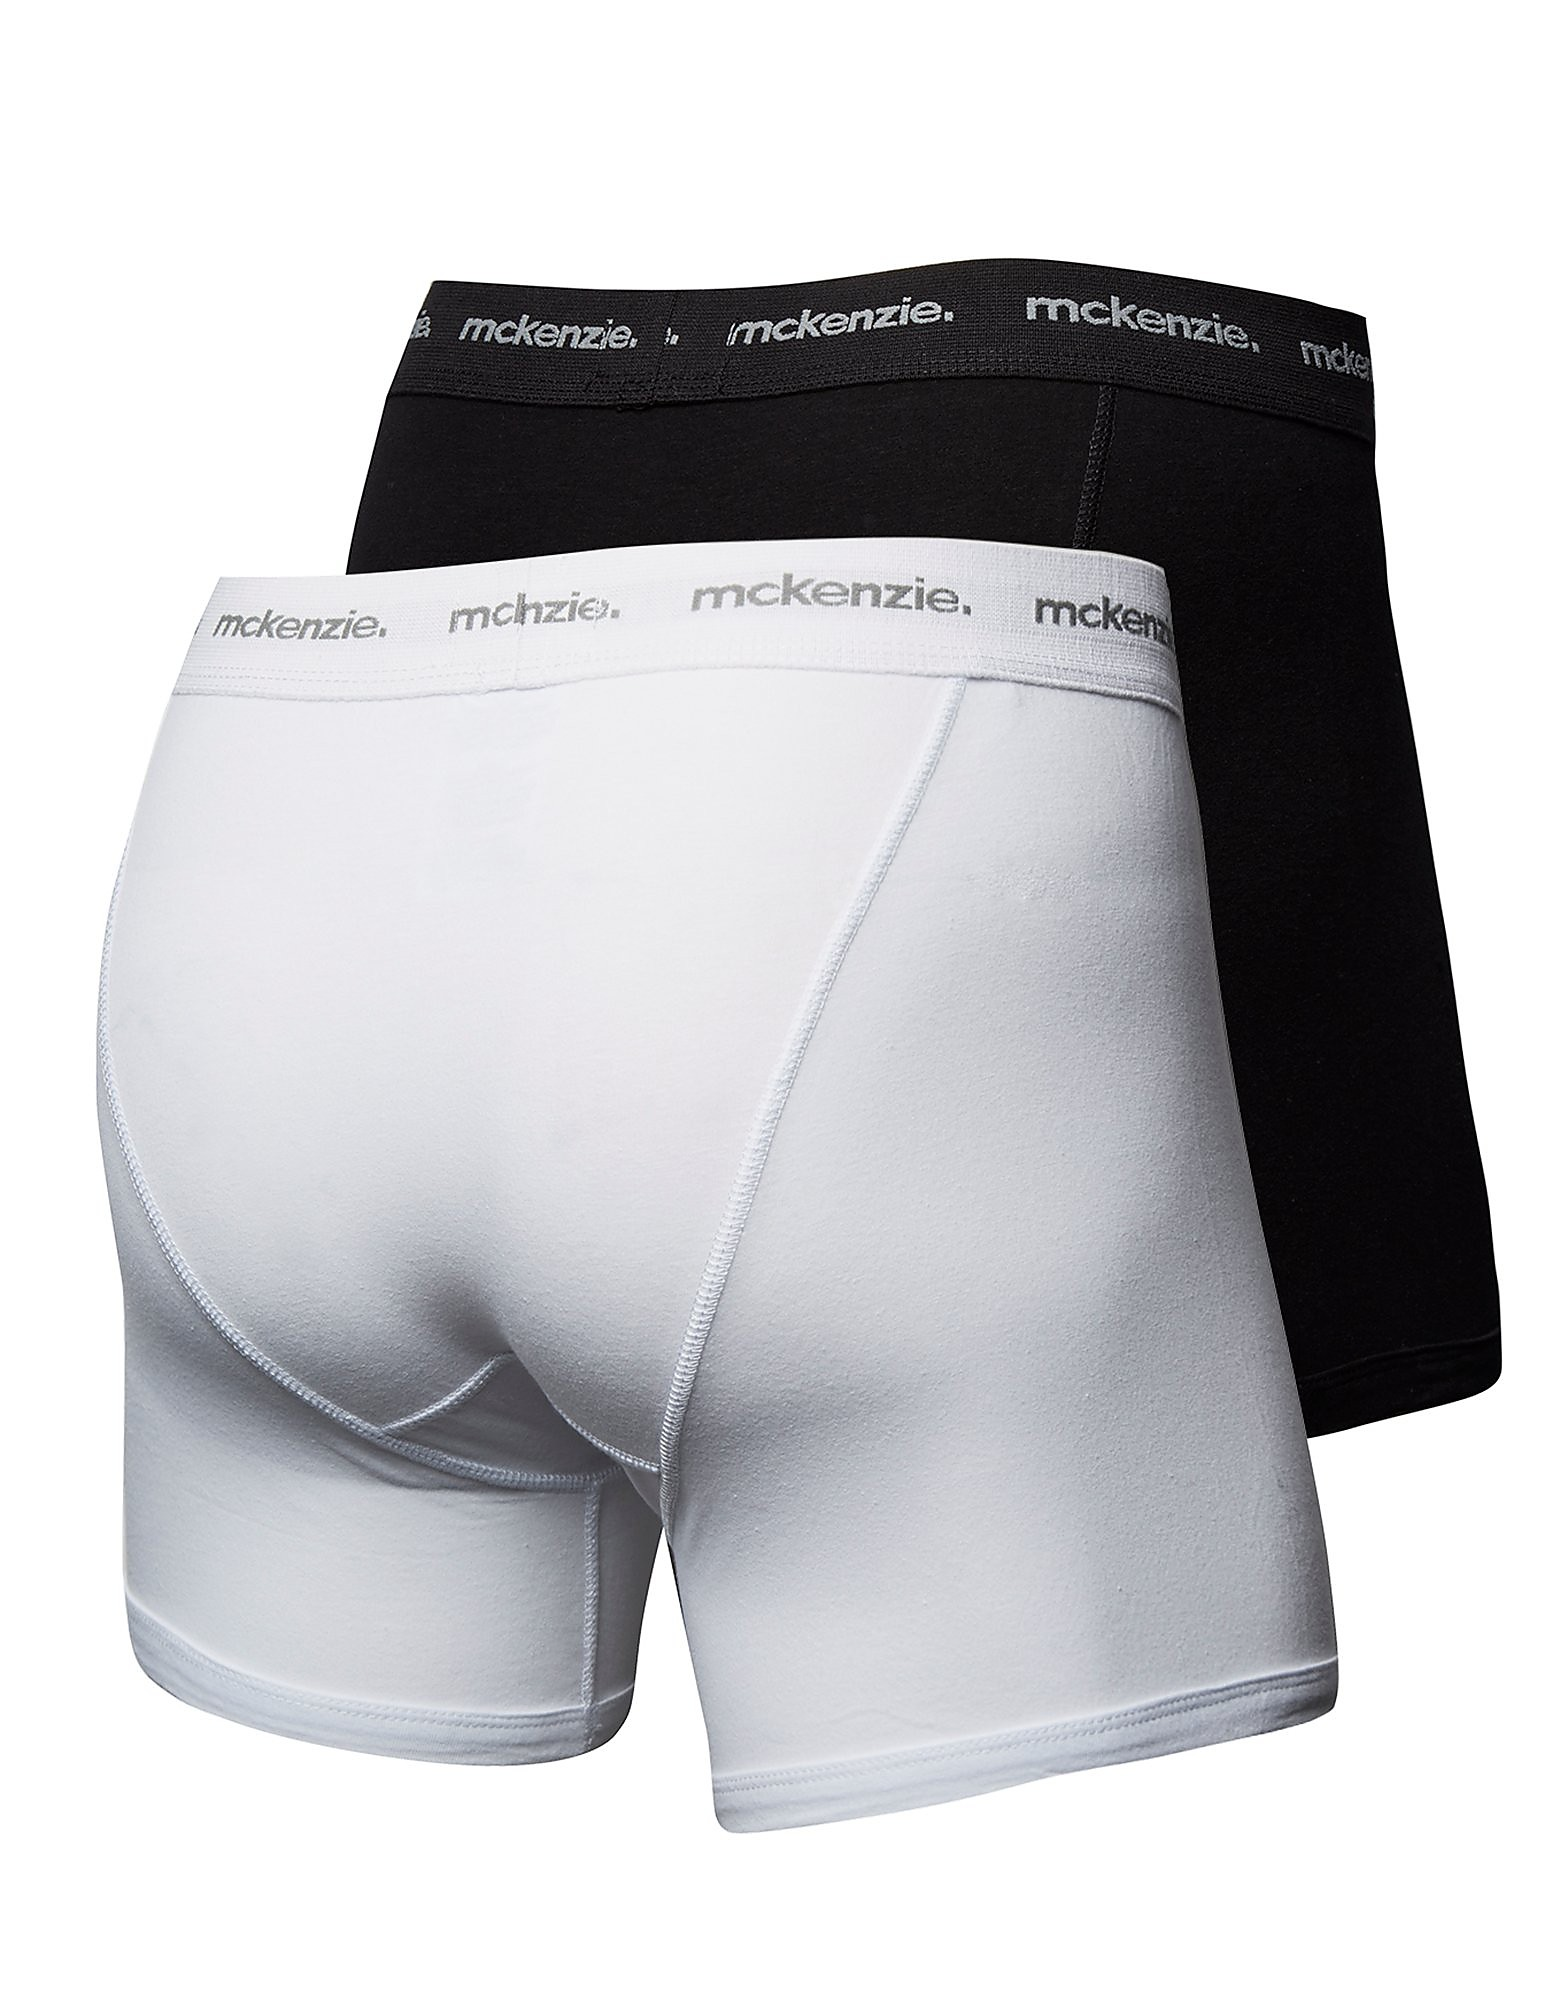 McKenzie 2 Pack Boxers